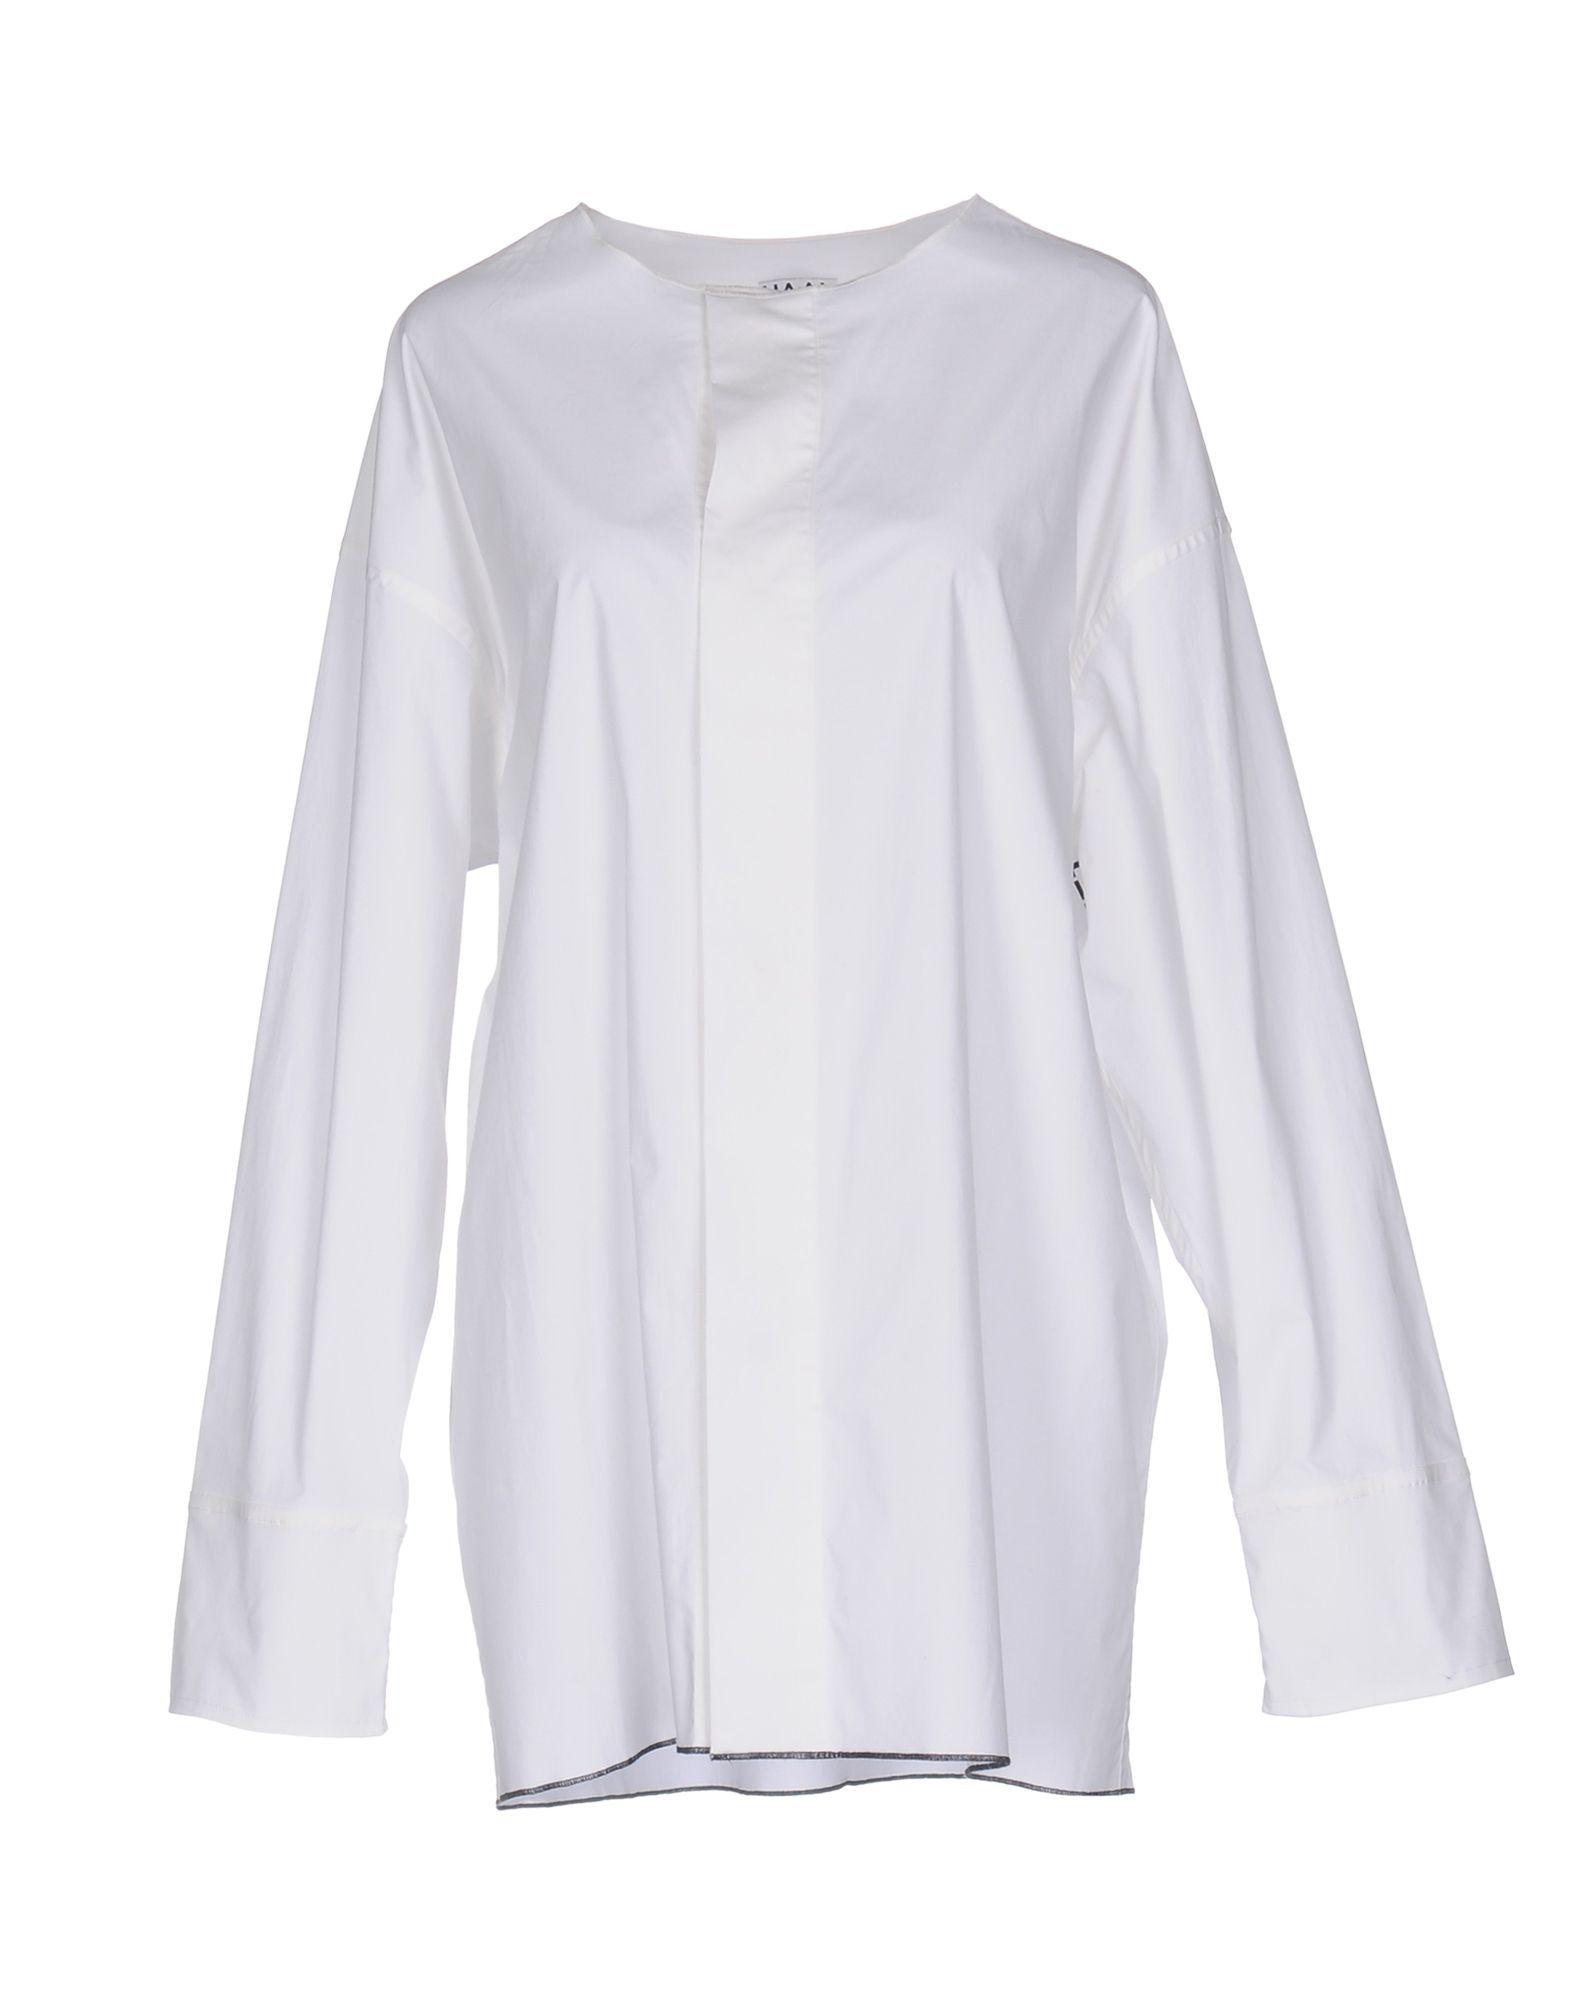 Camicie E Bluse Tinta Unita Haal Donna - Acquista online su 8kbpwPyAG6